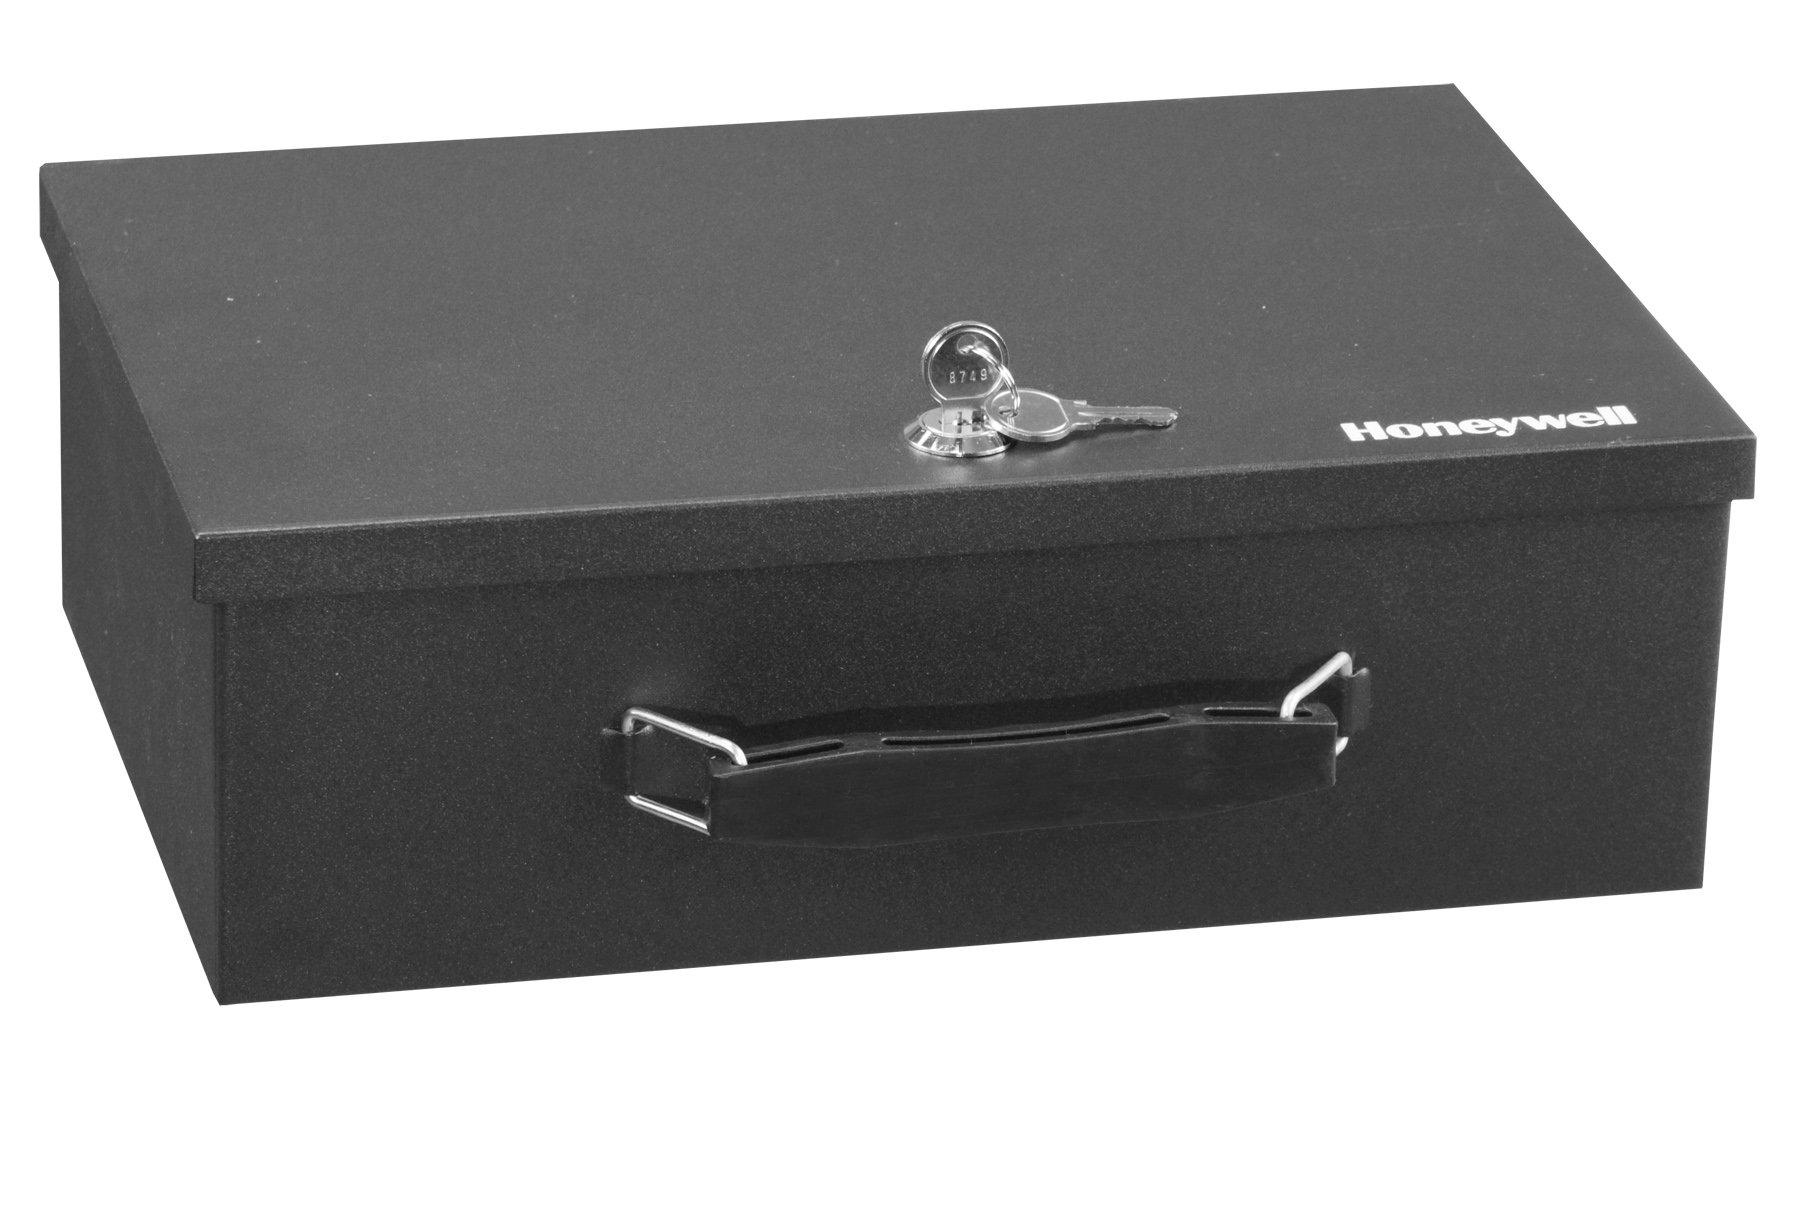 Honeywell Safes & Door Locks - 6104 Fire Resistant Steel Security Safe Box with Key Lock, 0.17-Cubic Feet, Black by Honeywell Safes & Door Locks